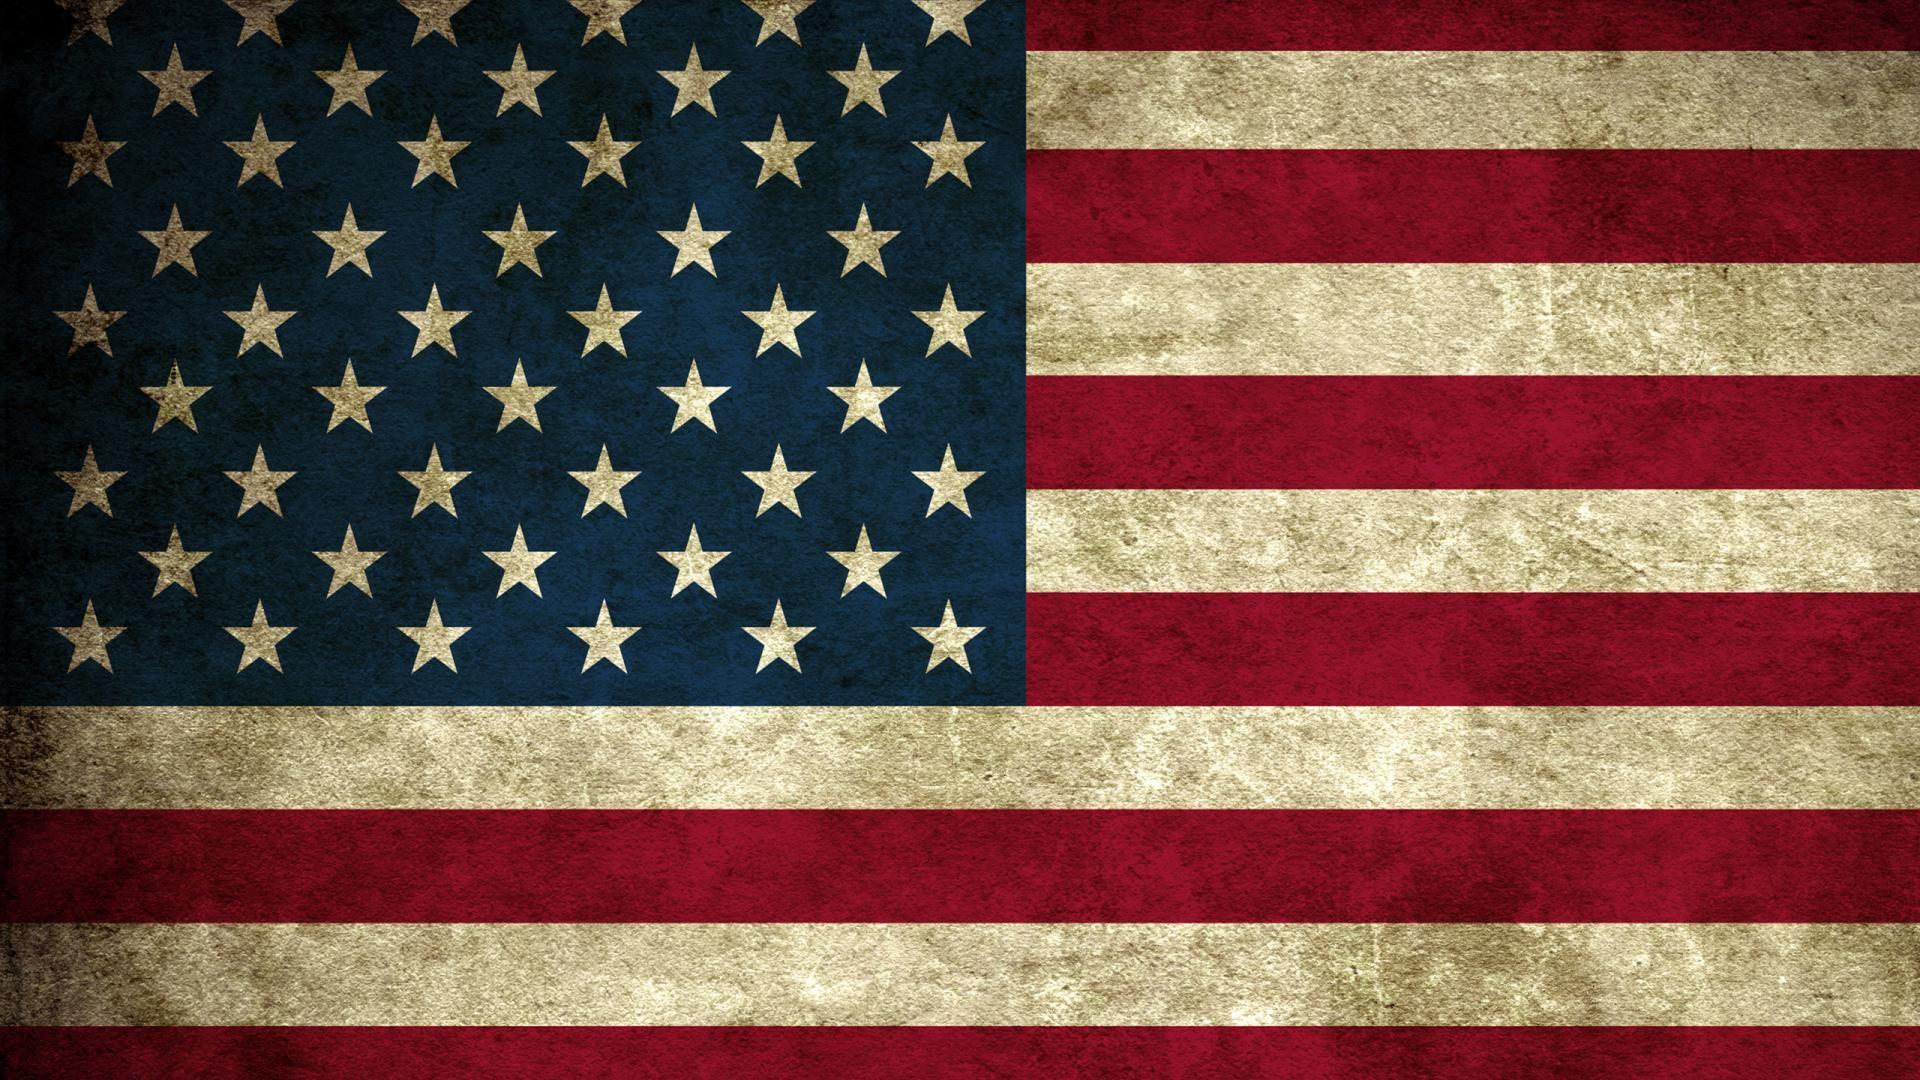 American Usa Flag Hd Wallpaper Bandera De Usa Bandera De Estados Unidos Bandera De Estados Unidos De America